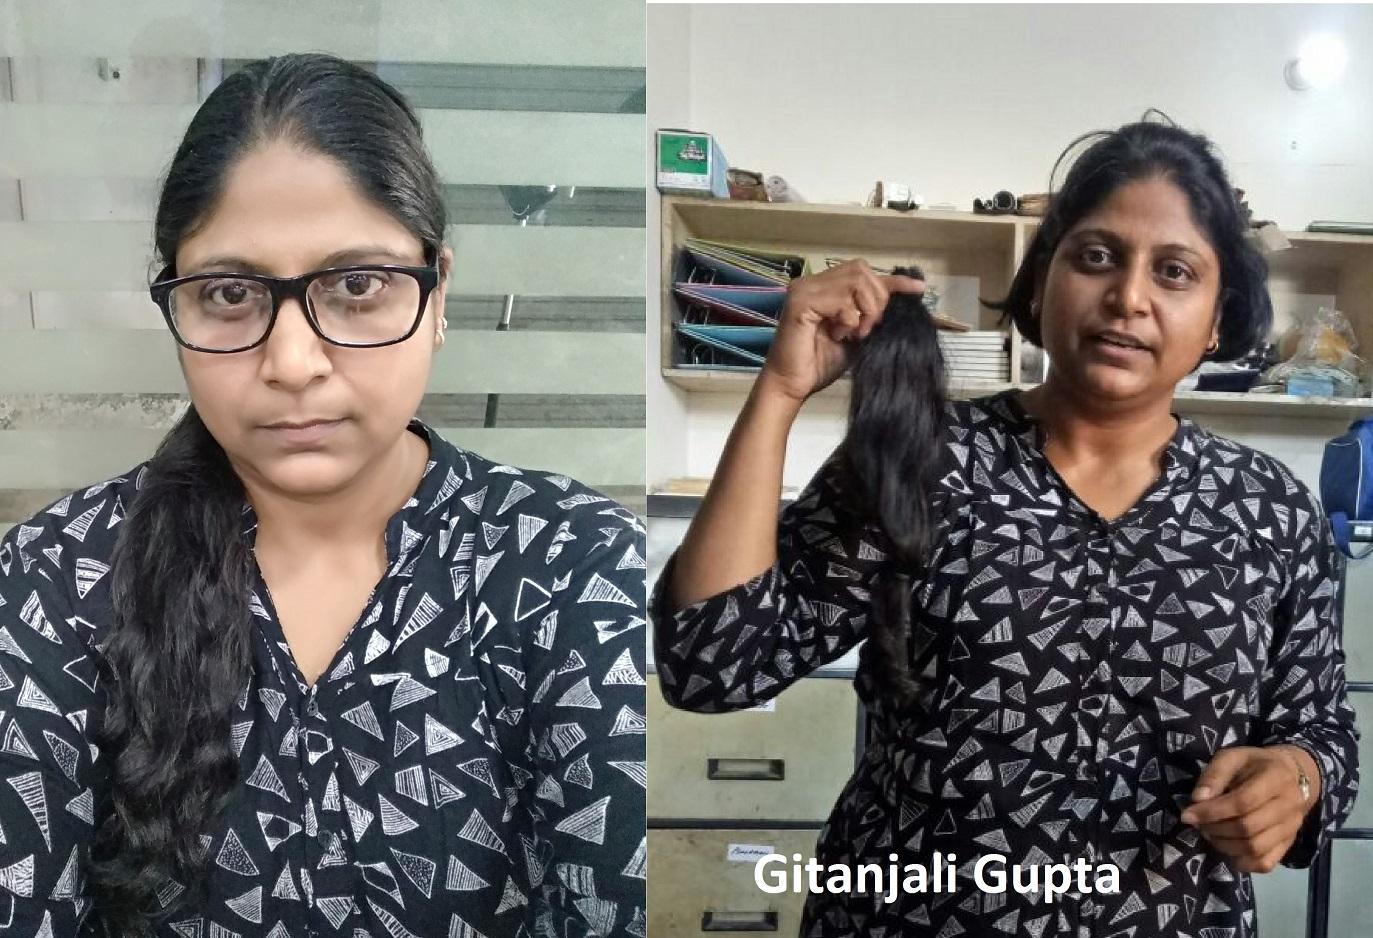 Gitanjali Gupta